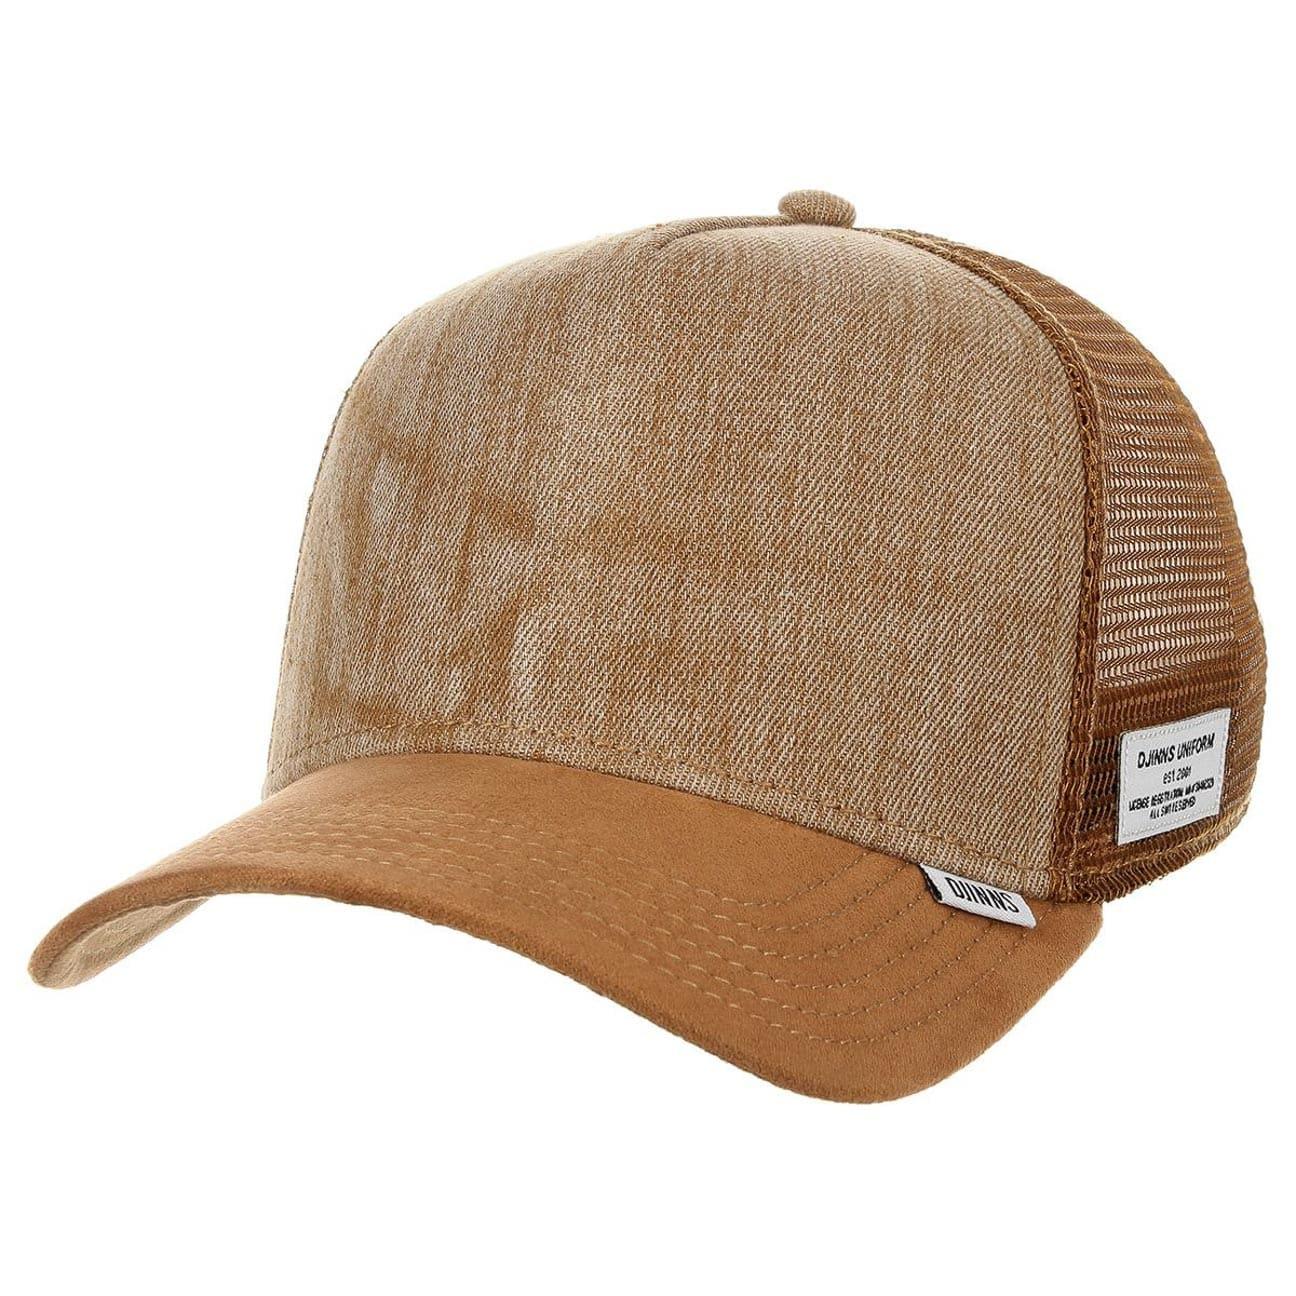 color denim trucker cap by djinns eur 21 99 hats. Black Bedroom Furniture Sets. Home Design Ideas